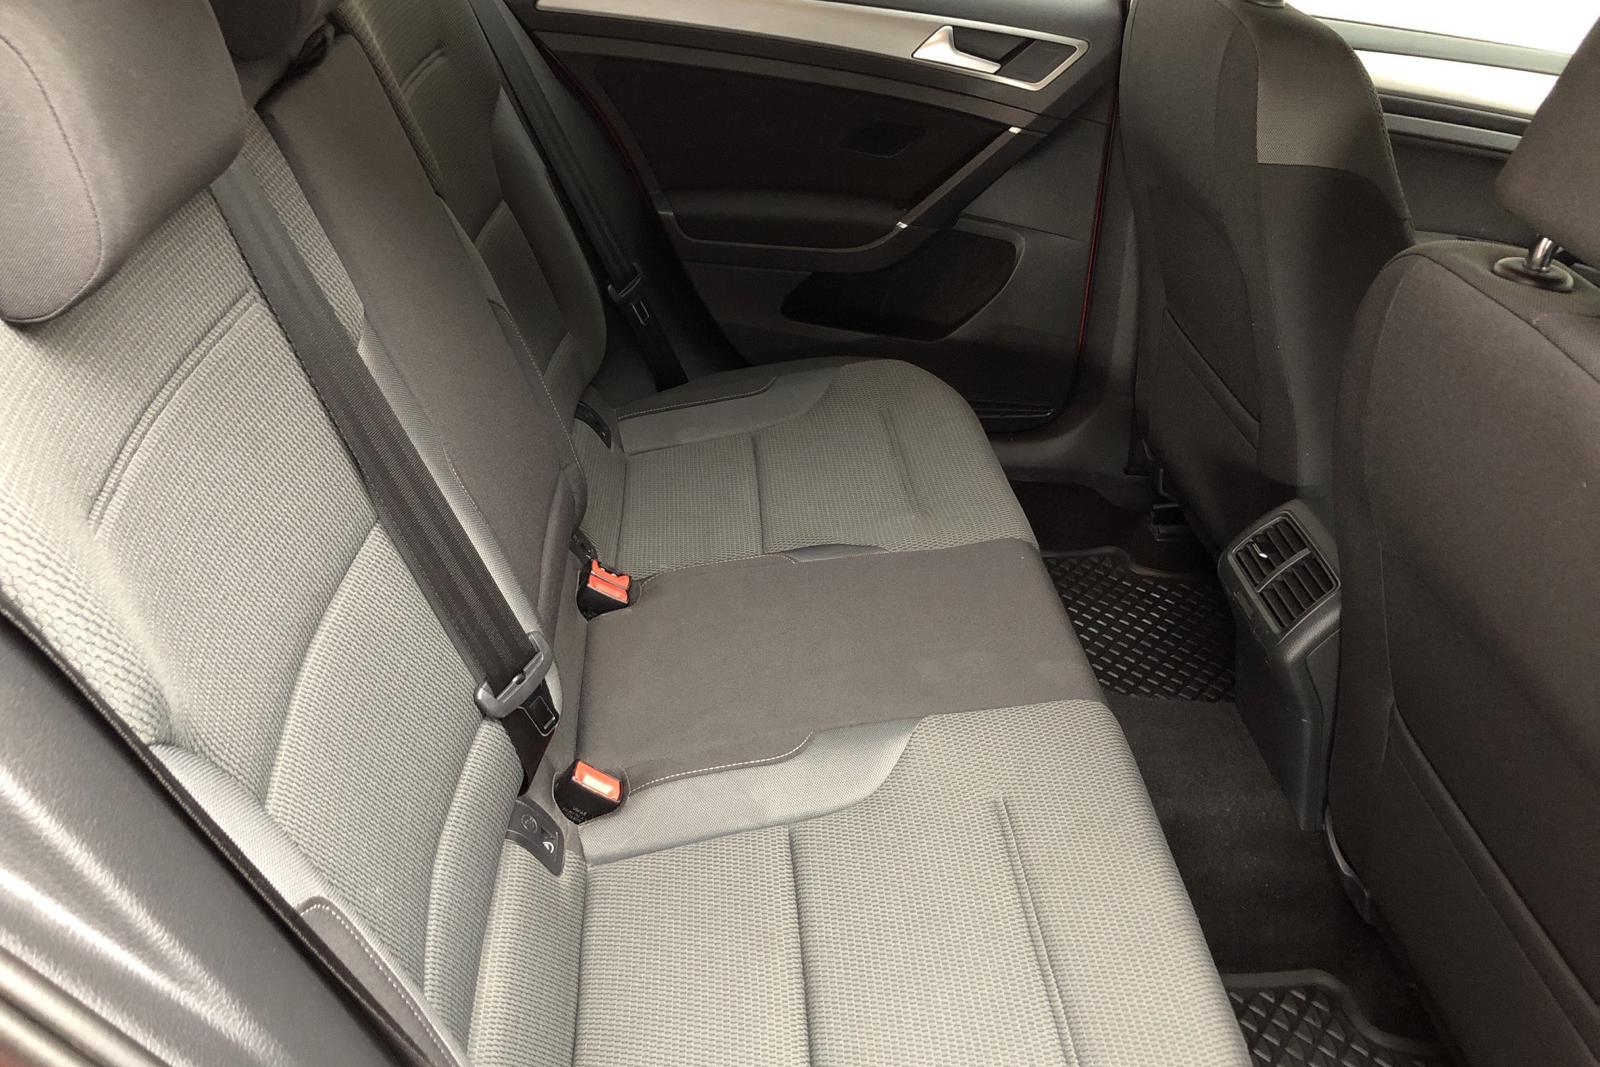 VW Golf VII 1.4 TSI Multifuel Sportscombi (125hk) - 3 801 mil - Manuell - röd - 2016